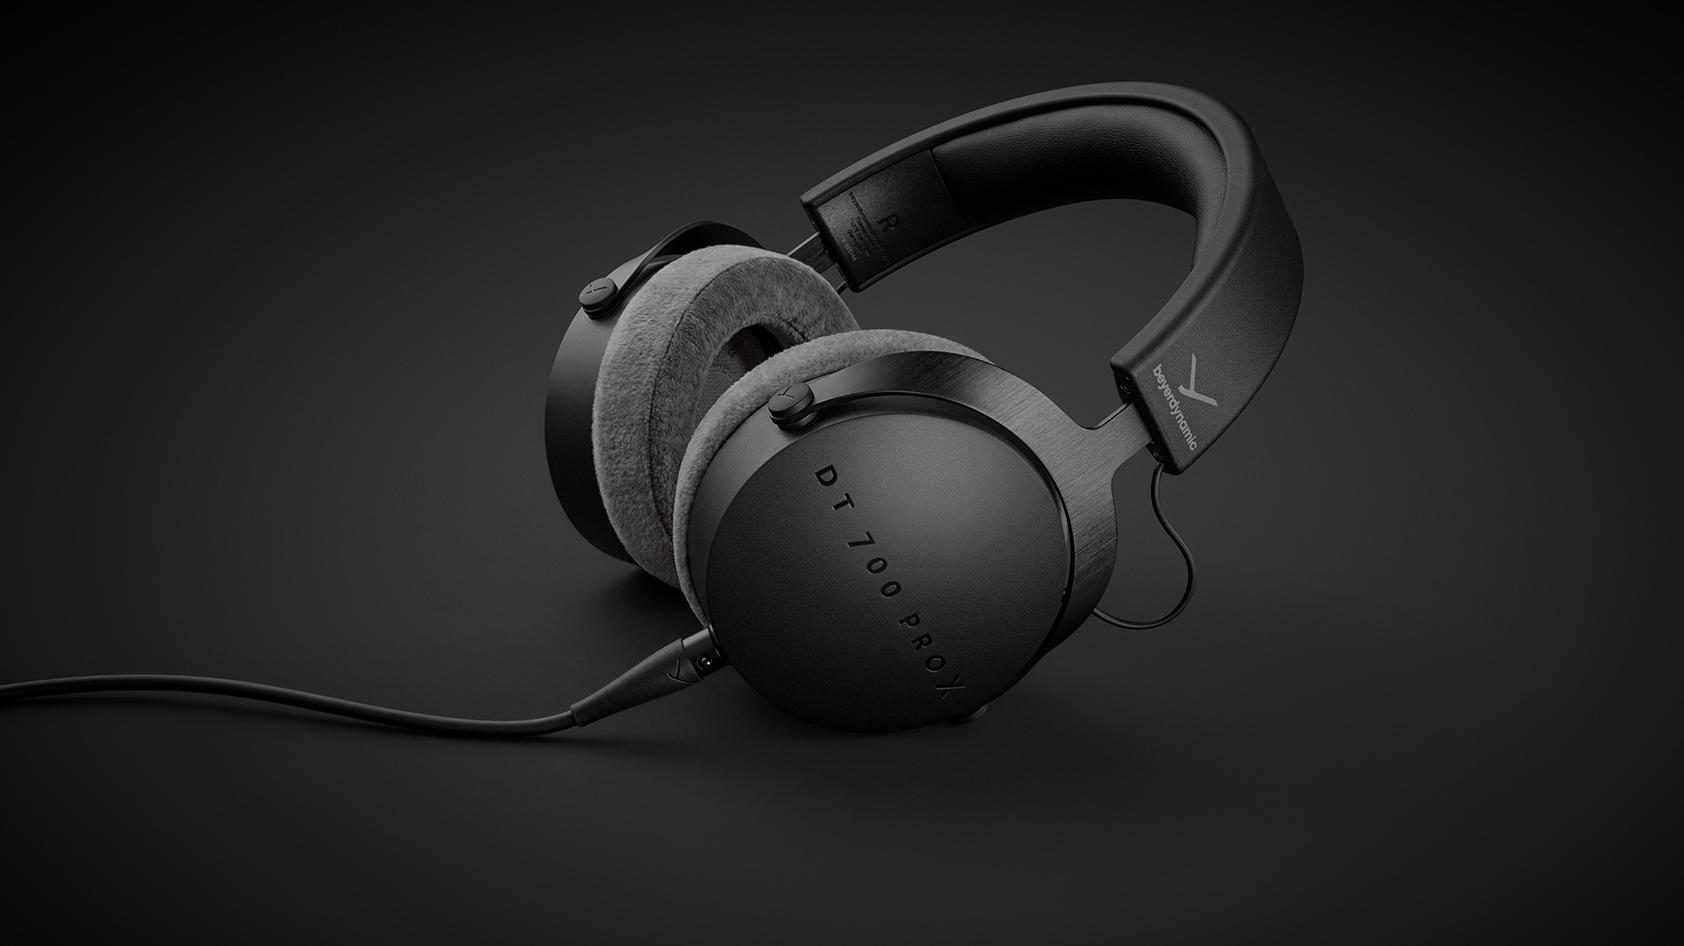 The Beyerdynamic DT 700 closed headphones against a black background.